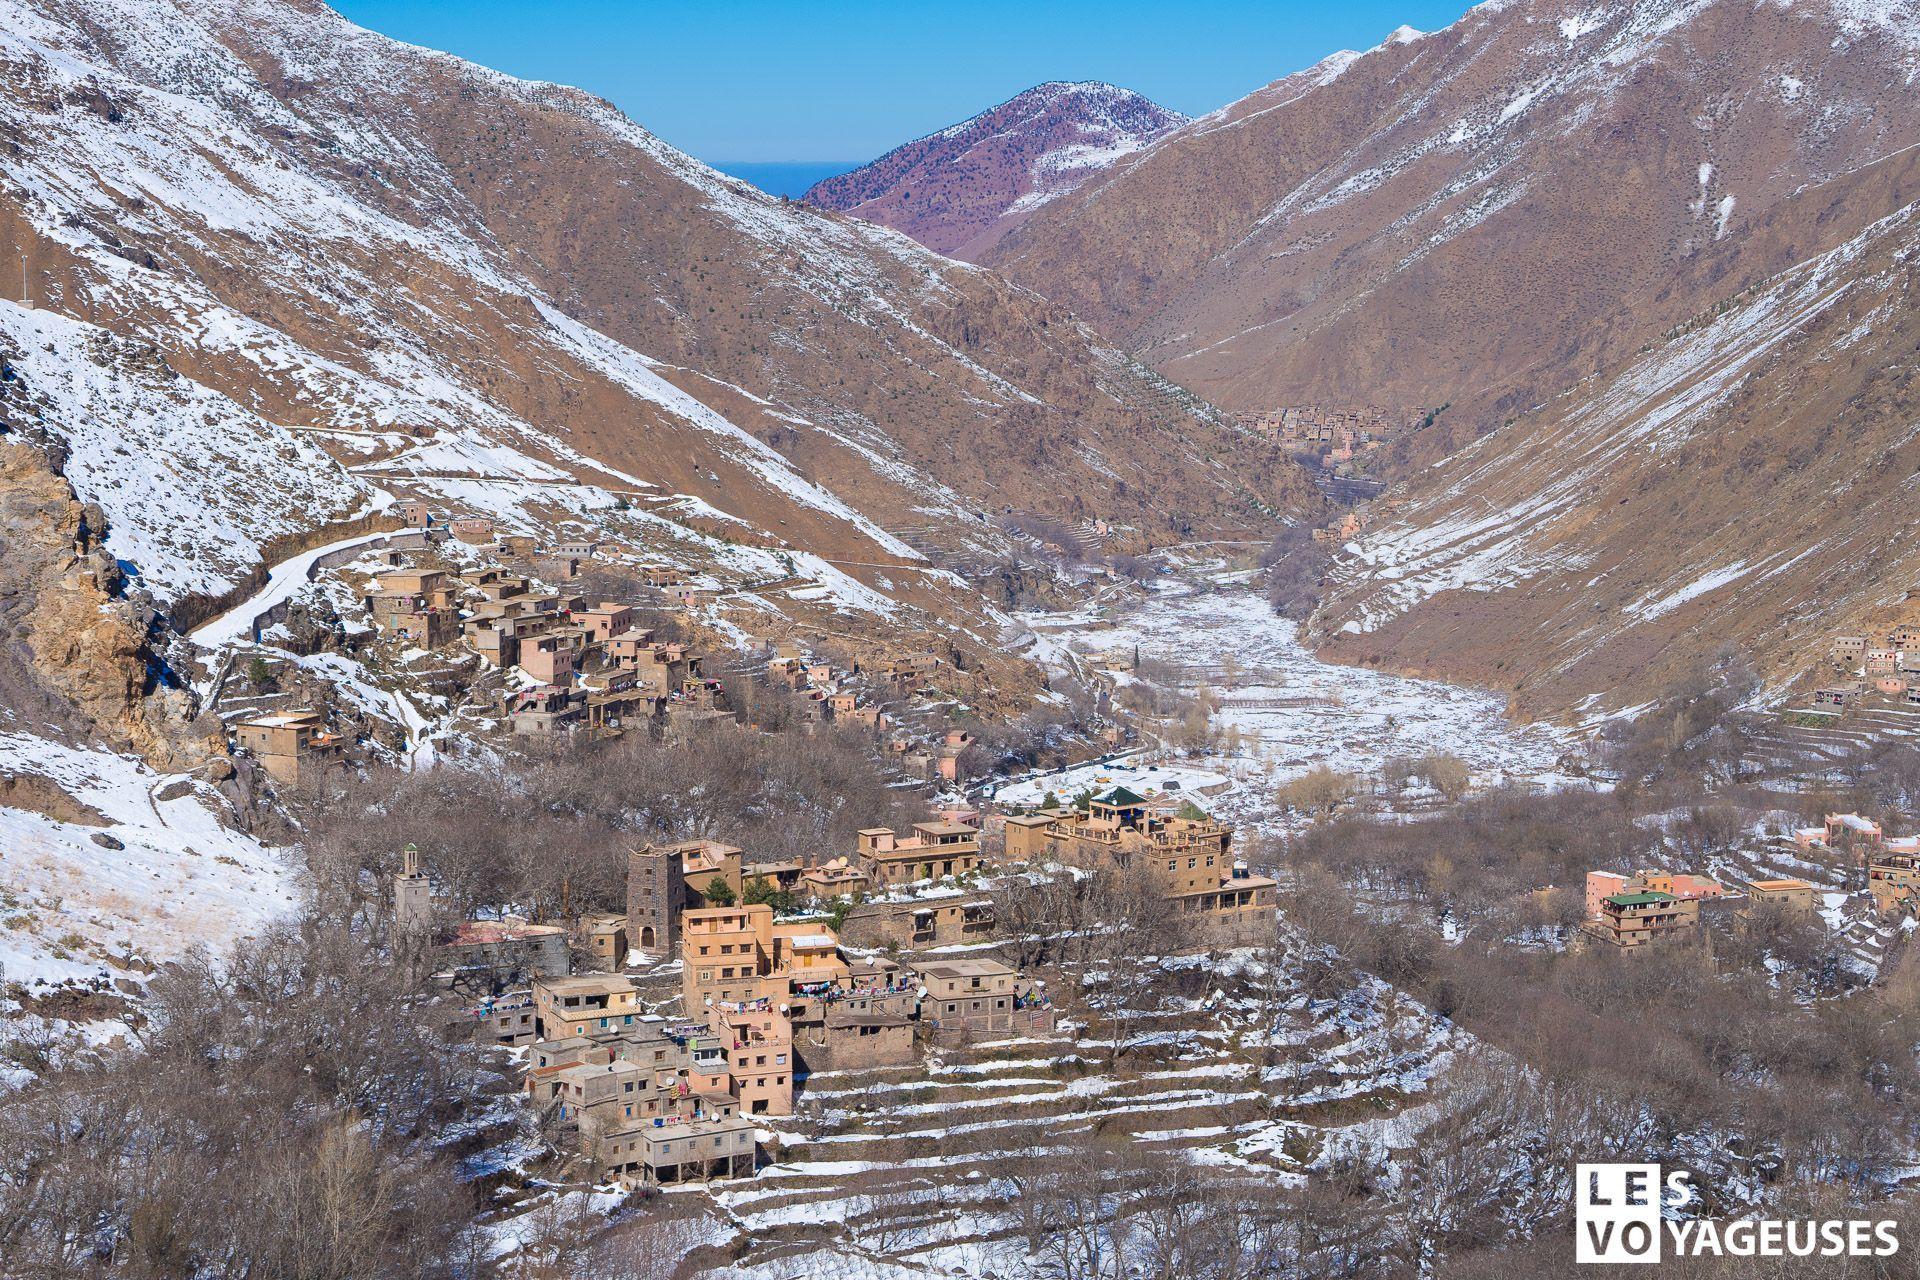 Les-voyageuses-maroc-imlil-hiver-09982